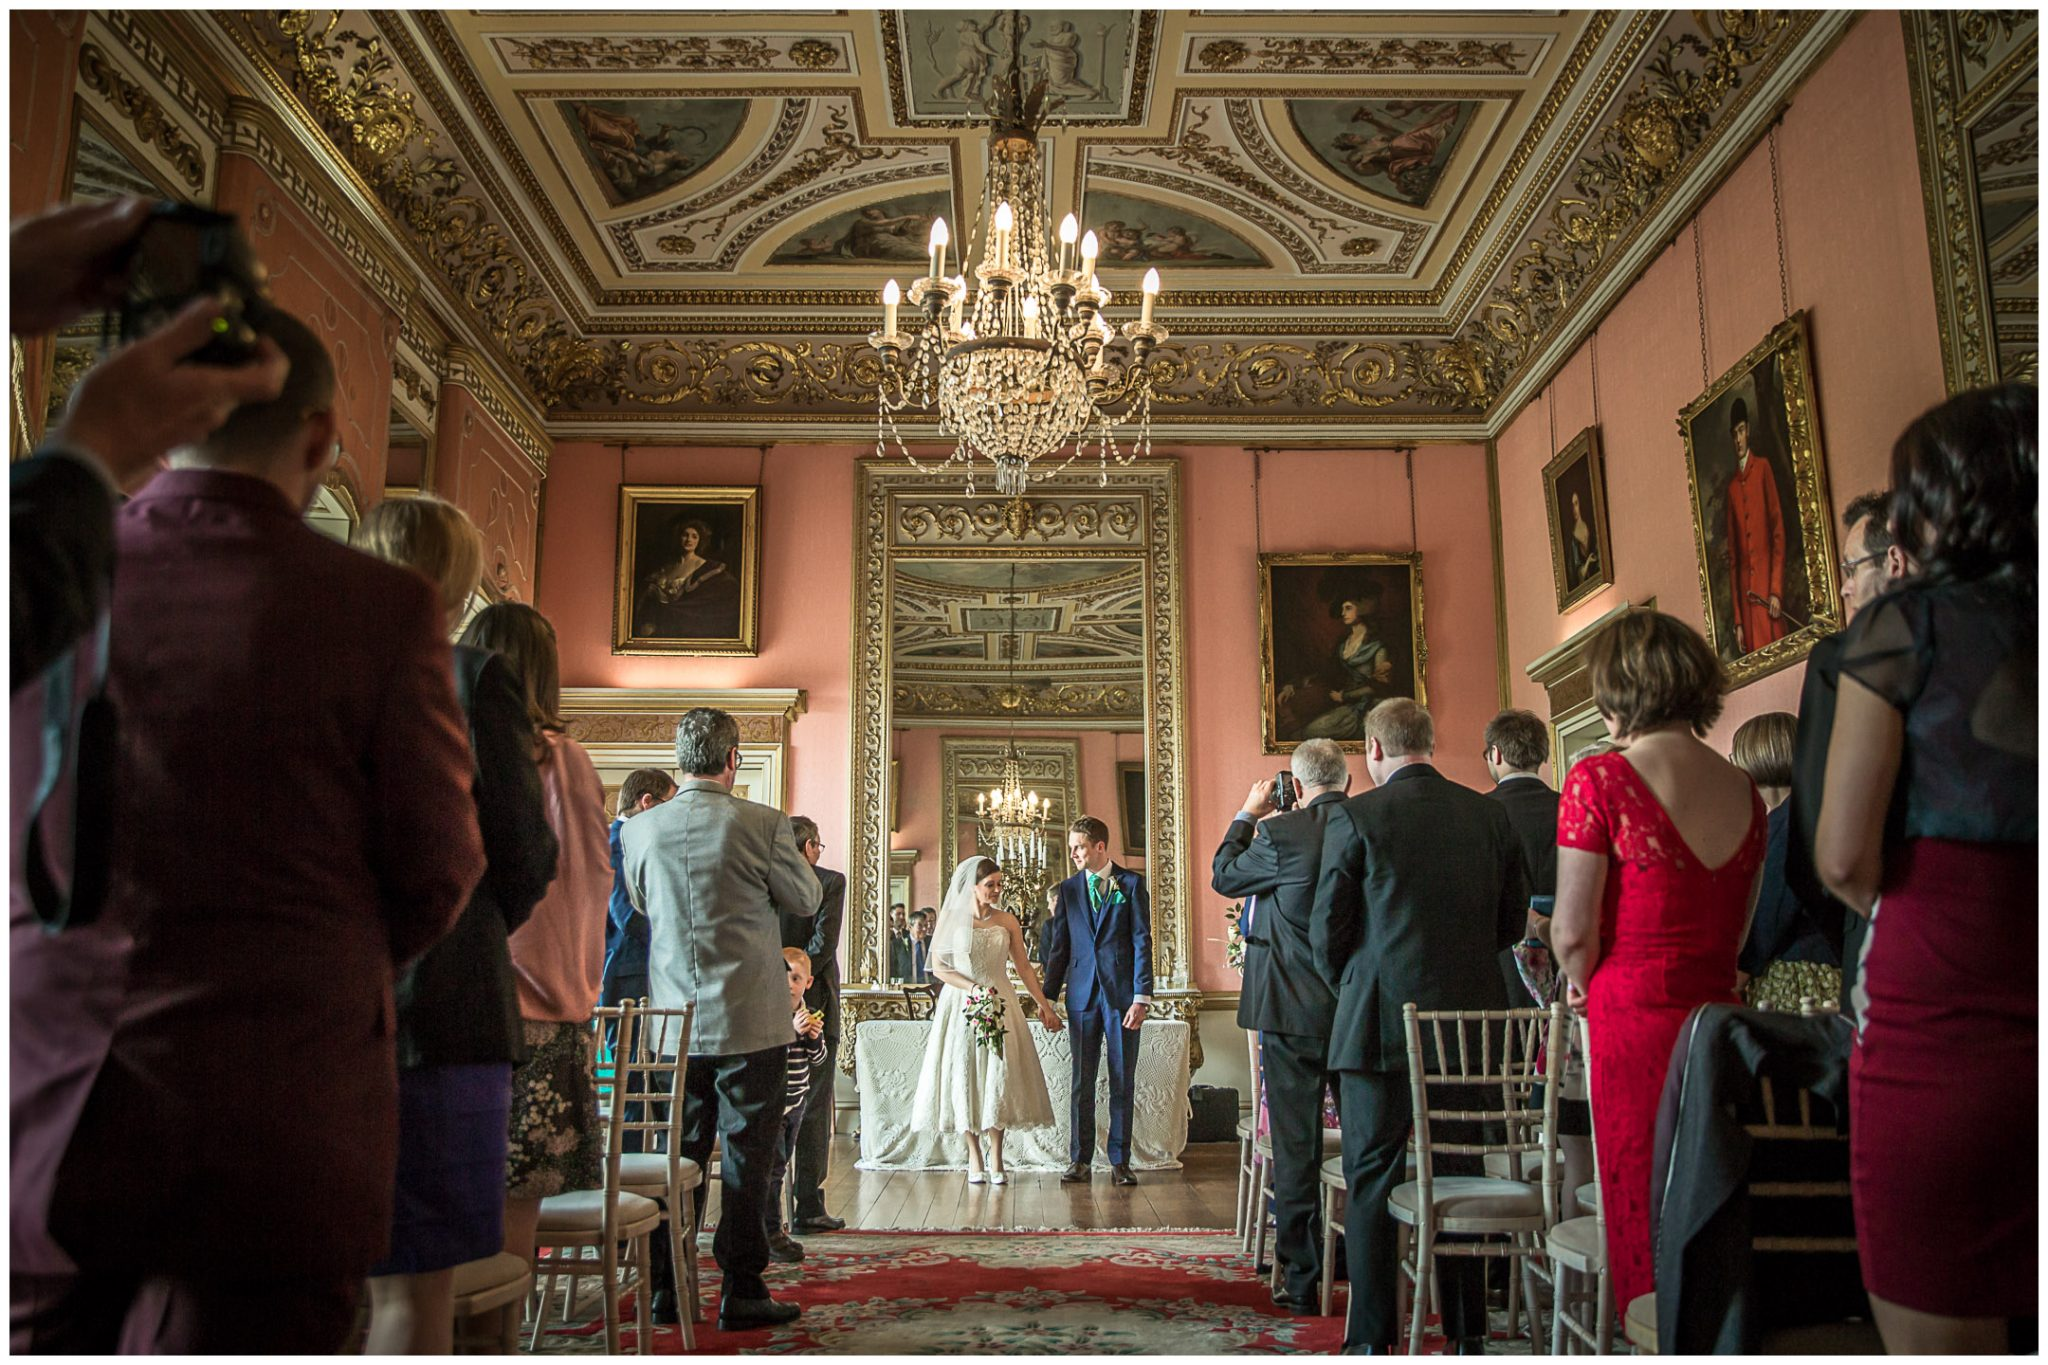 Avington Park wedding photography couple in ballroom before walking down aisle